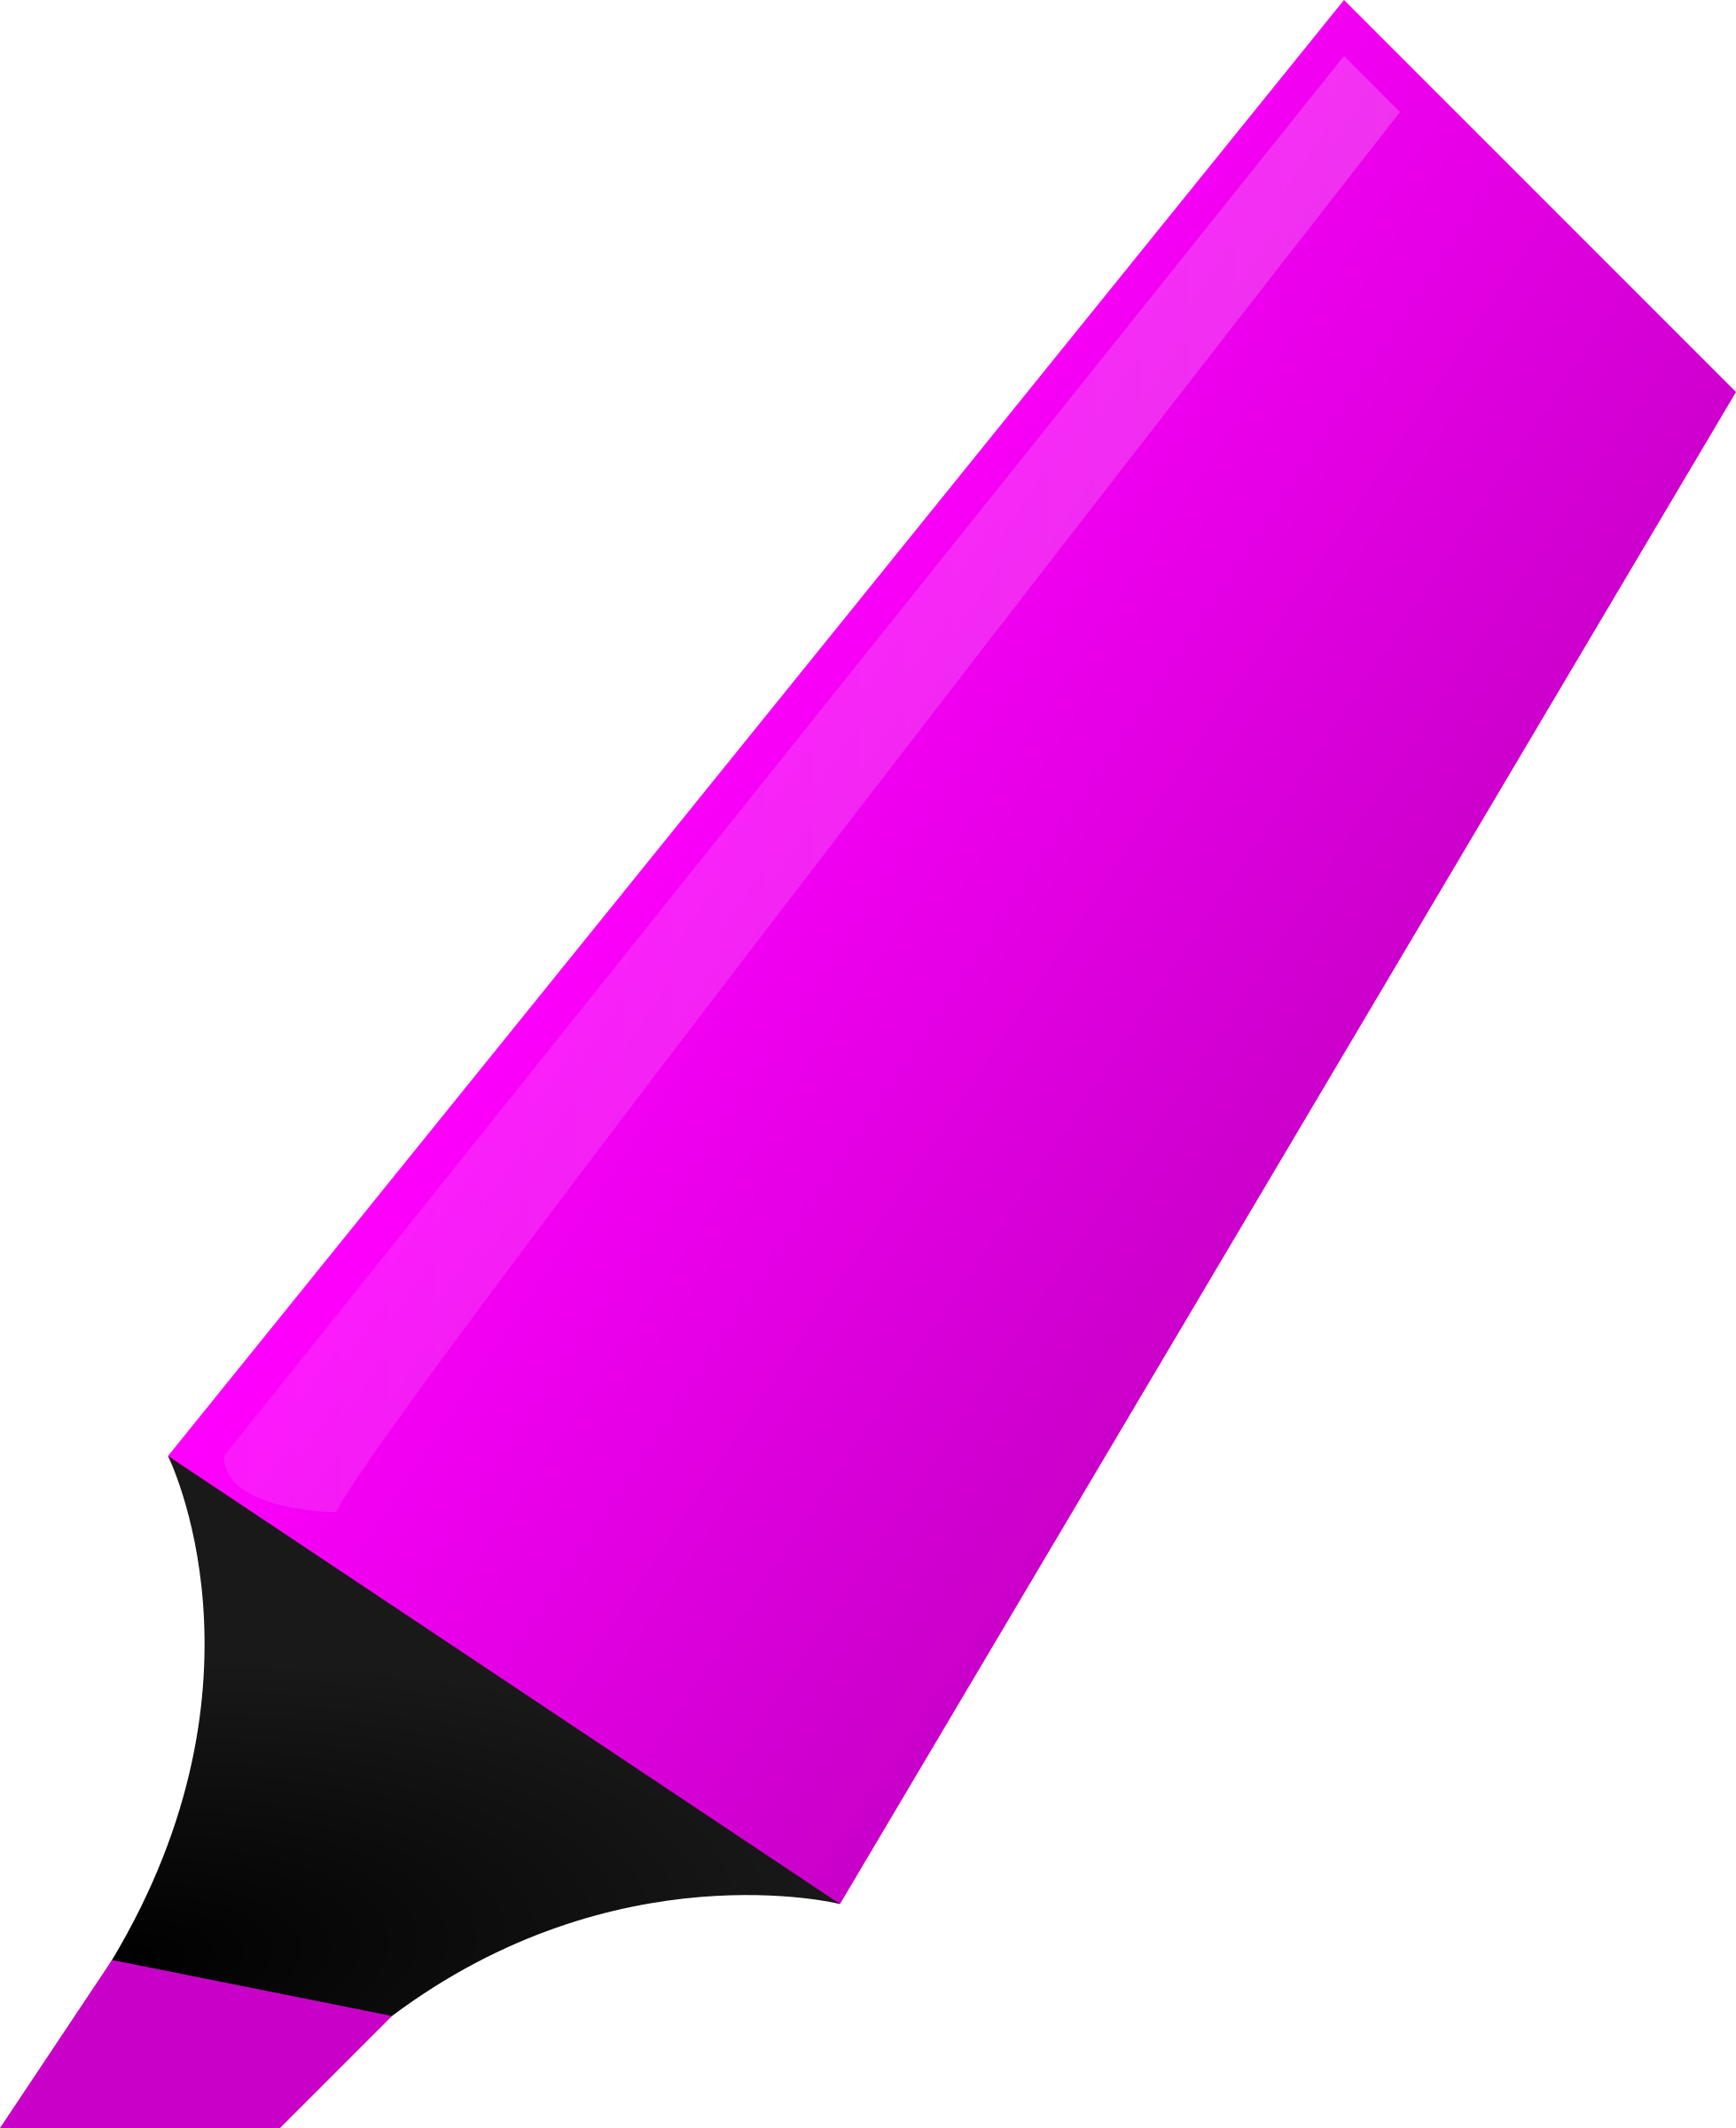 Highlighter clipart clip art royalty free library Free Highlighter Cliparts, Download Free Clip Art, Free Clip ... clip art royalty free library